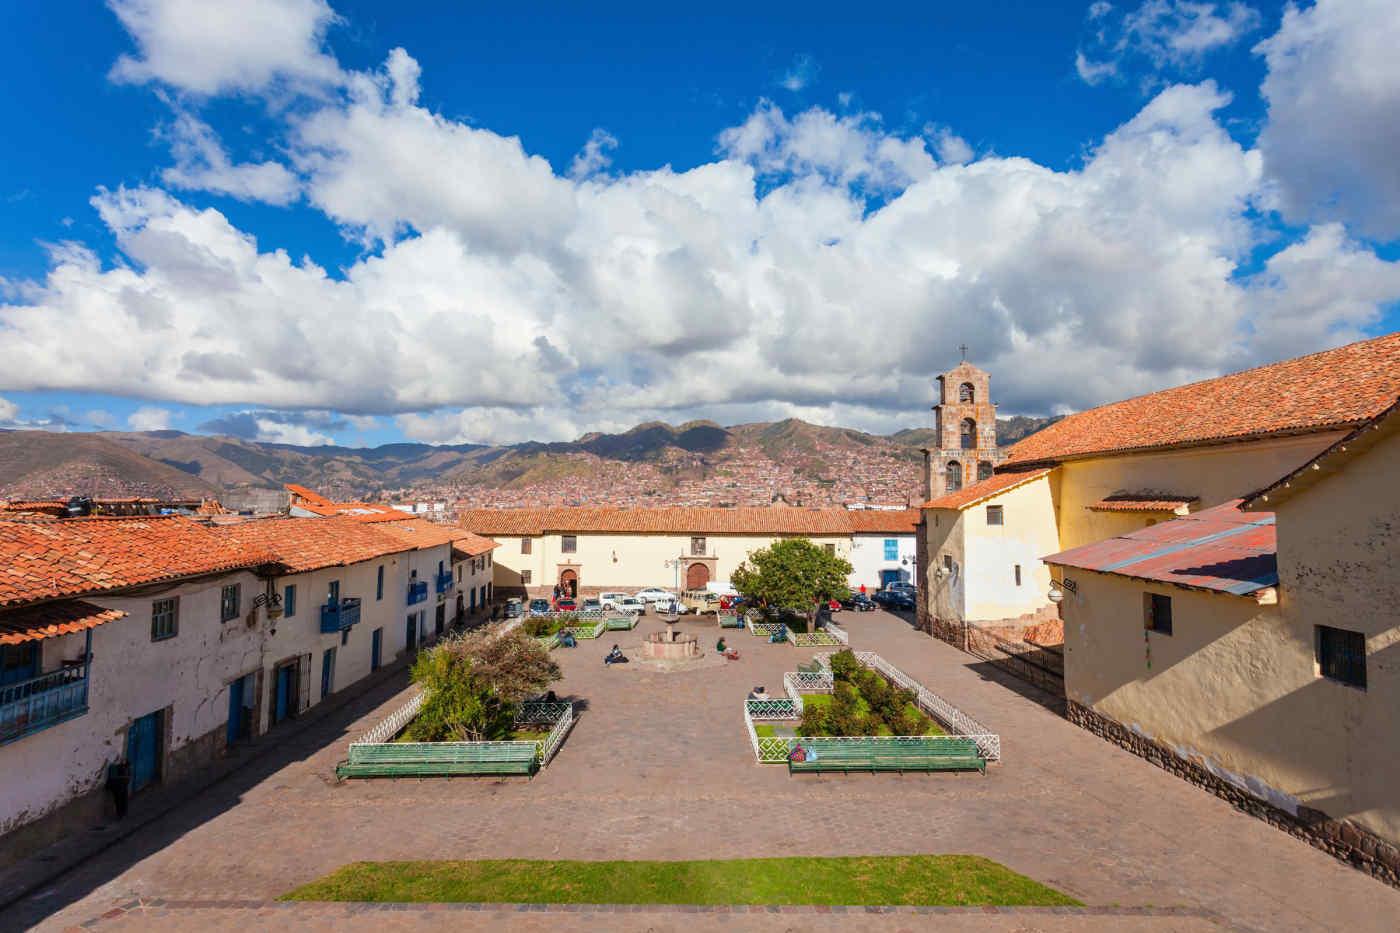 San Blas, Cusco